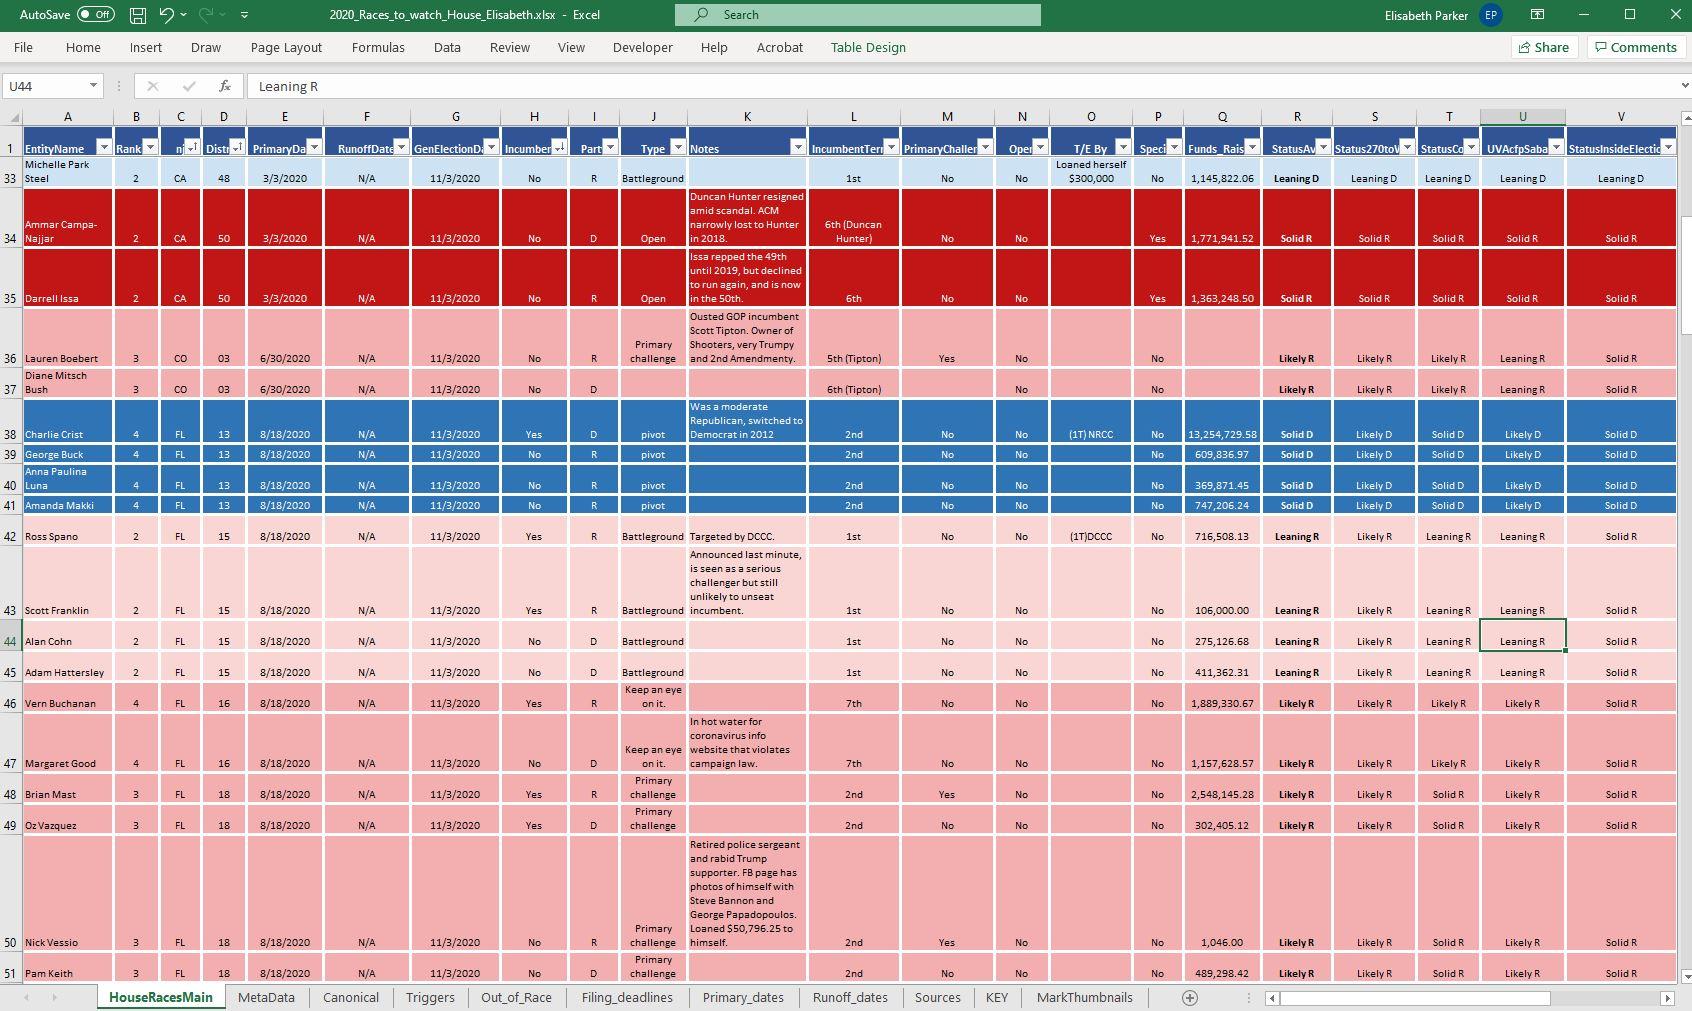 Screenshot of 2020 U.S. House Races to Watch spreadsheet.